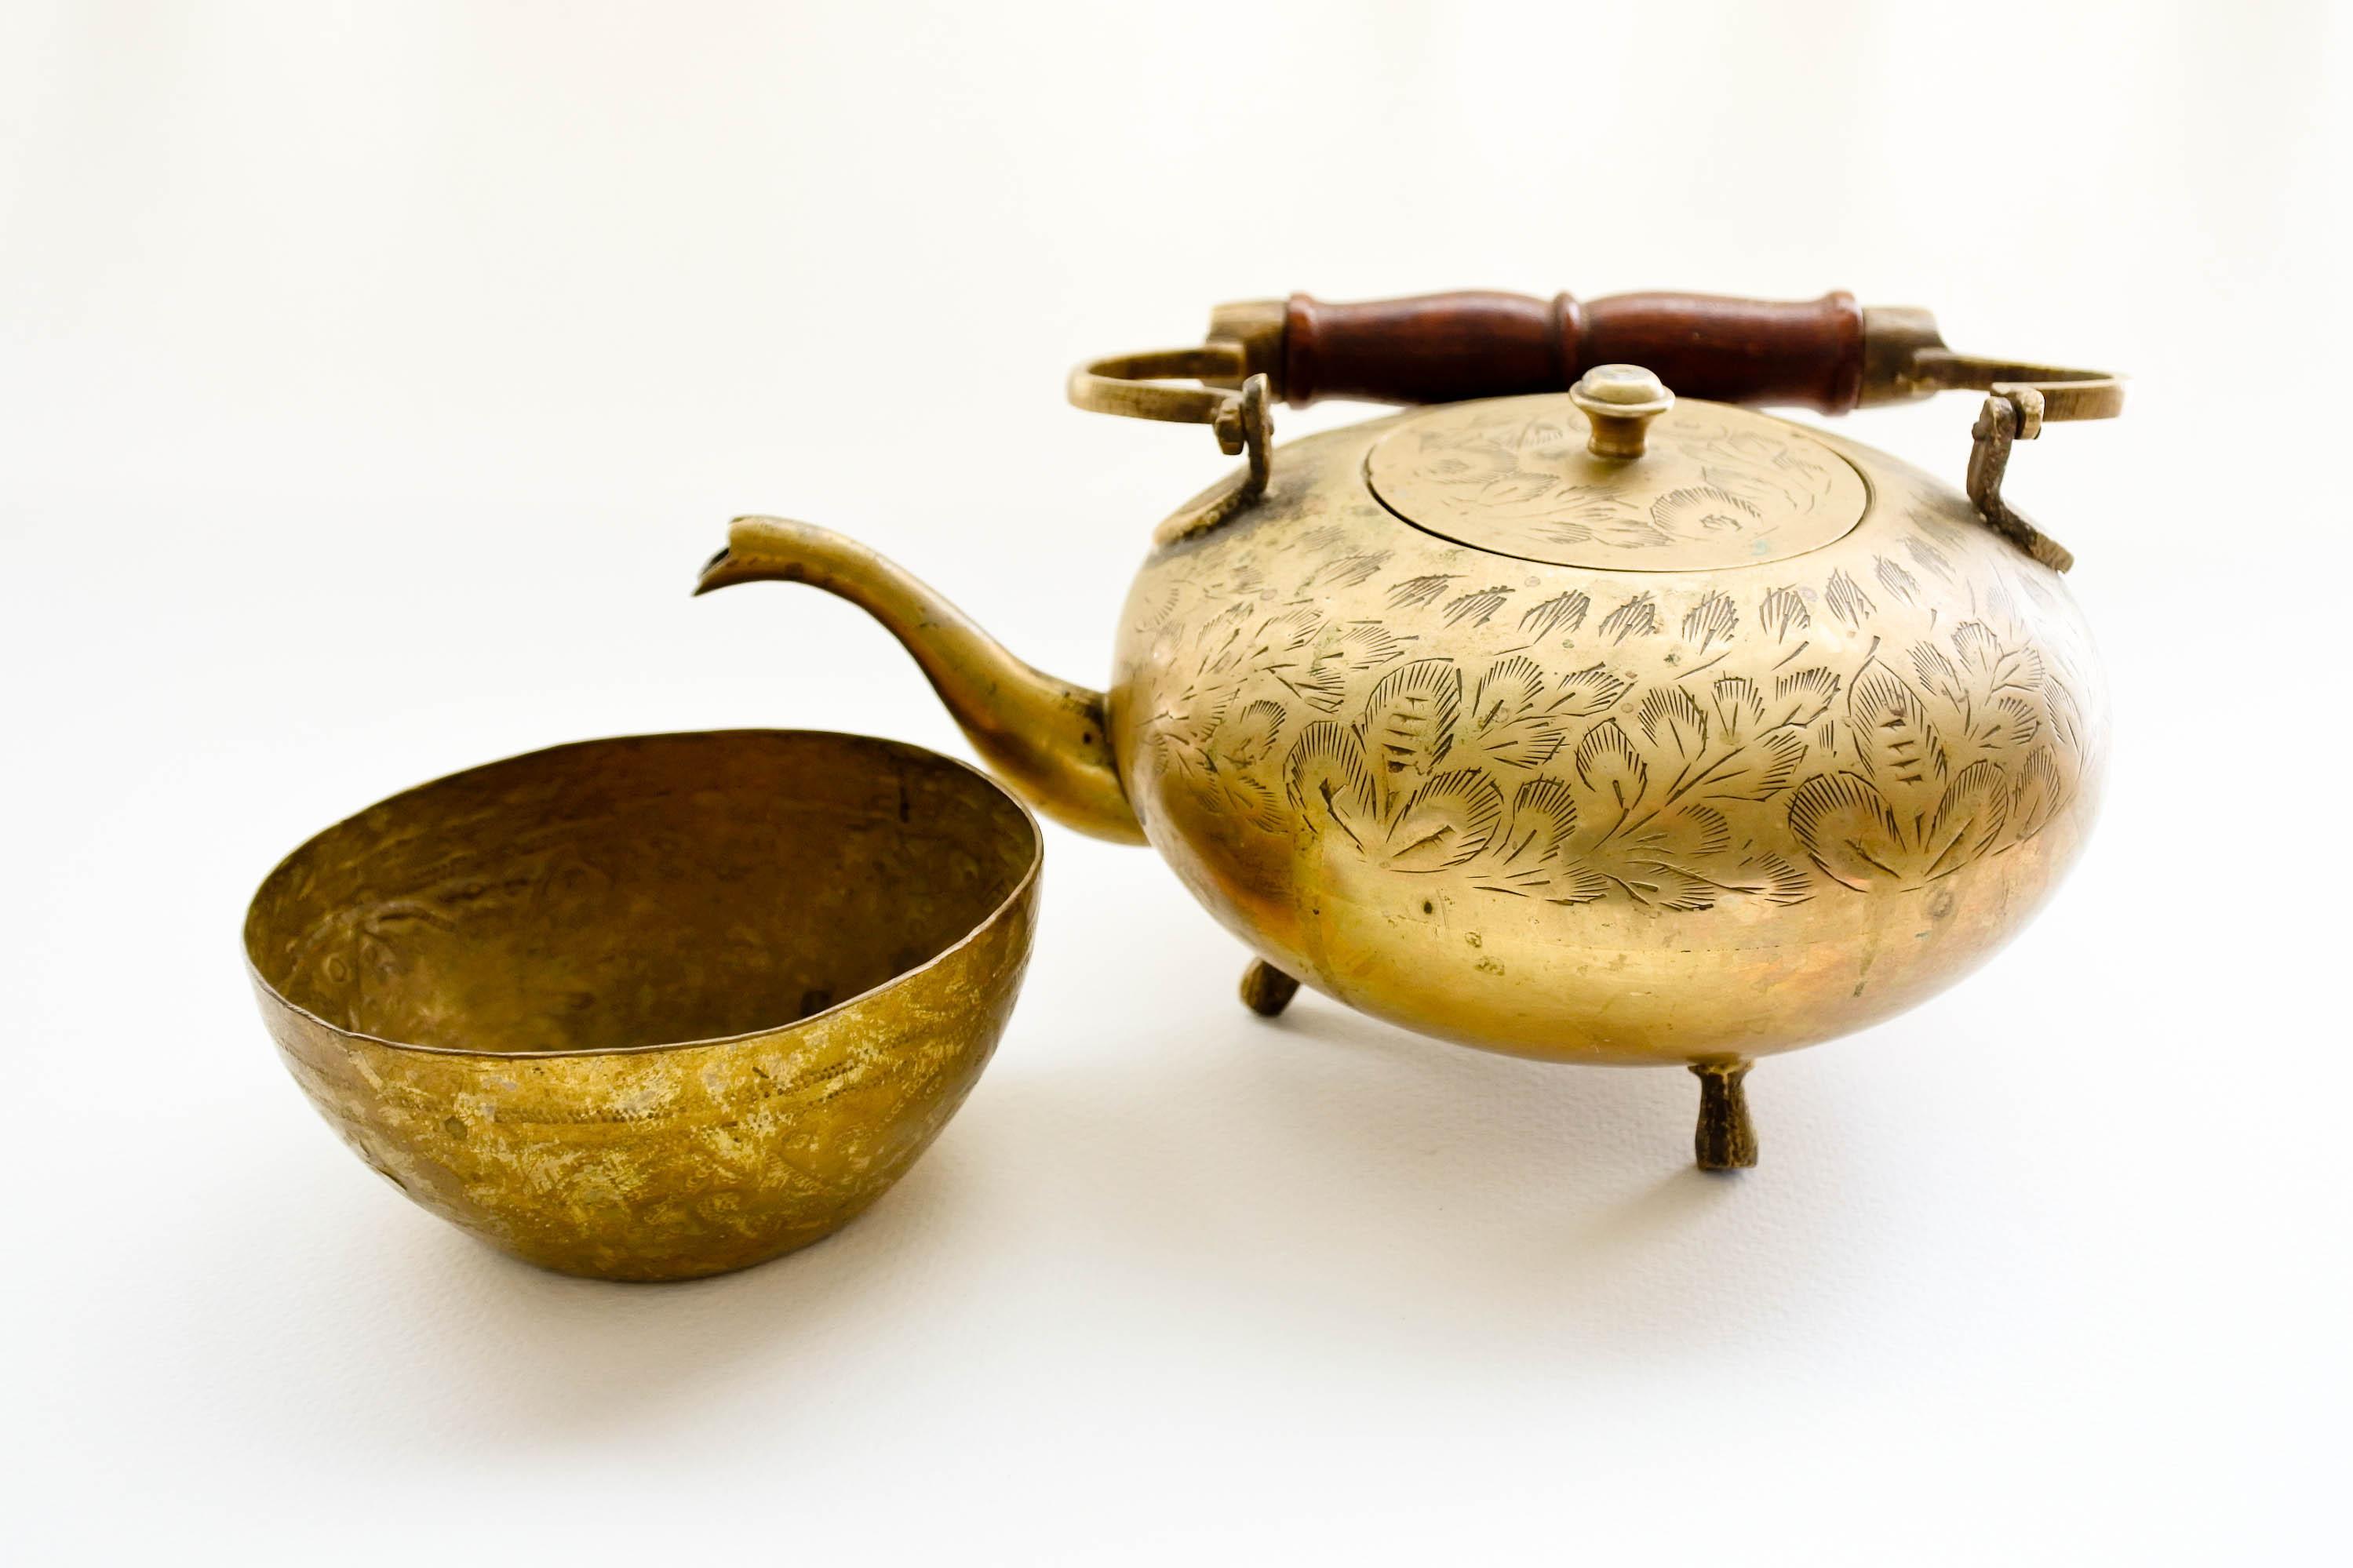 Silk Roads: Art of Tea by Jewel K. Goode